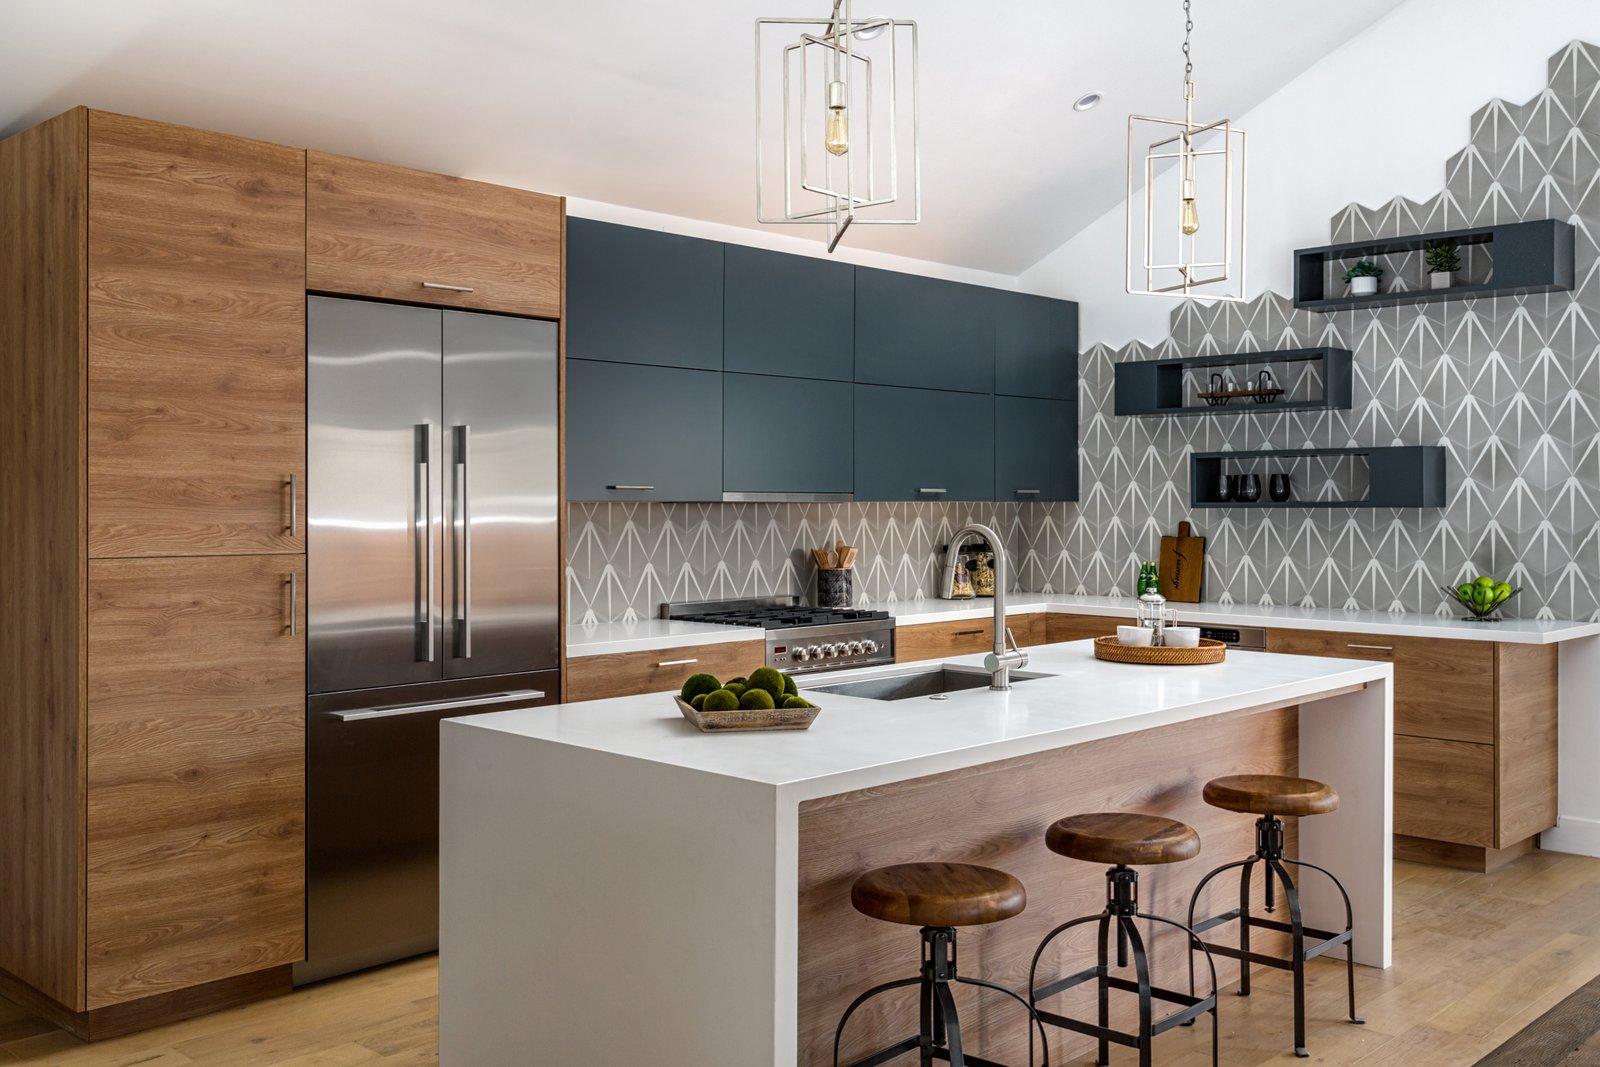 Kitchen, Refrigerator, Range, Range Hood, Wood, Laminate, Light Hardwood, Ceramic Tile, and Ceiling  Best Kitchen Laminate Ceiling Photos from A Dwell-Like Kitchen In Costa Mesa